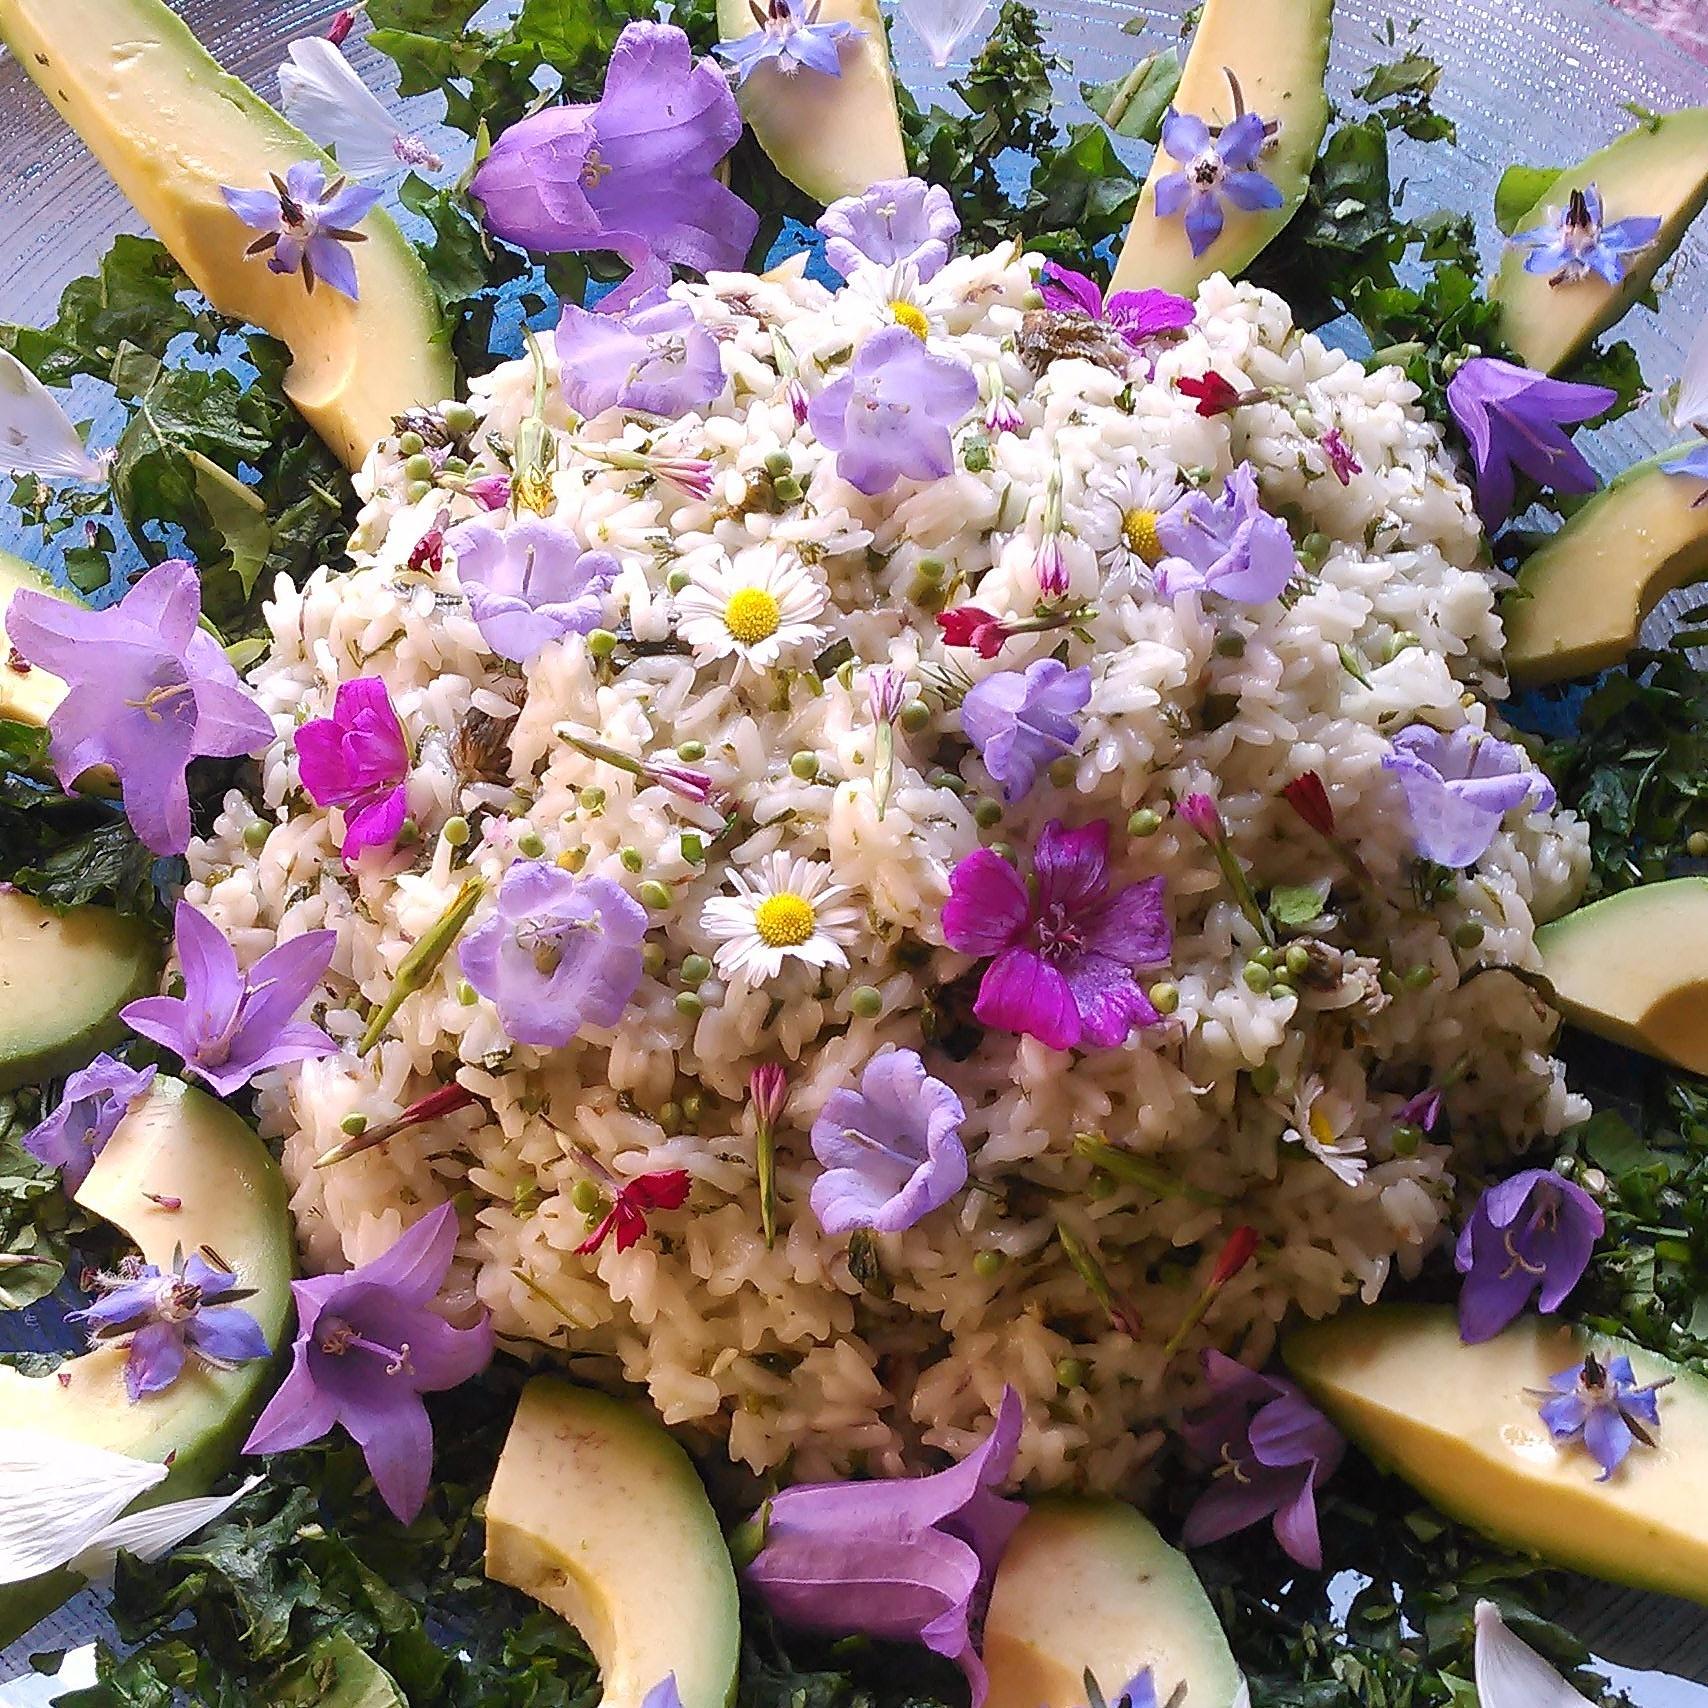 Blomstrende risotto fra Siris Ville Have